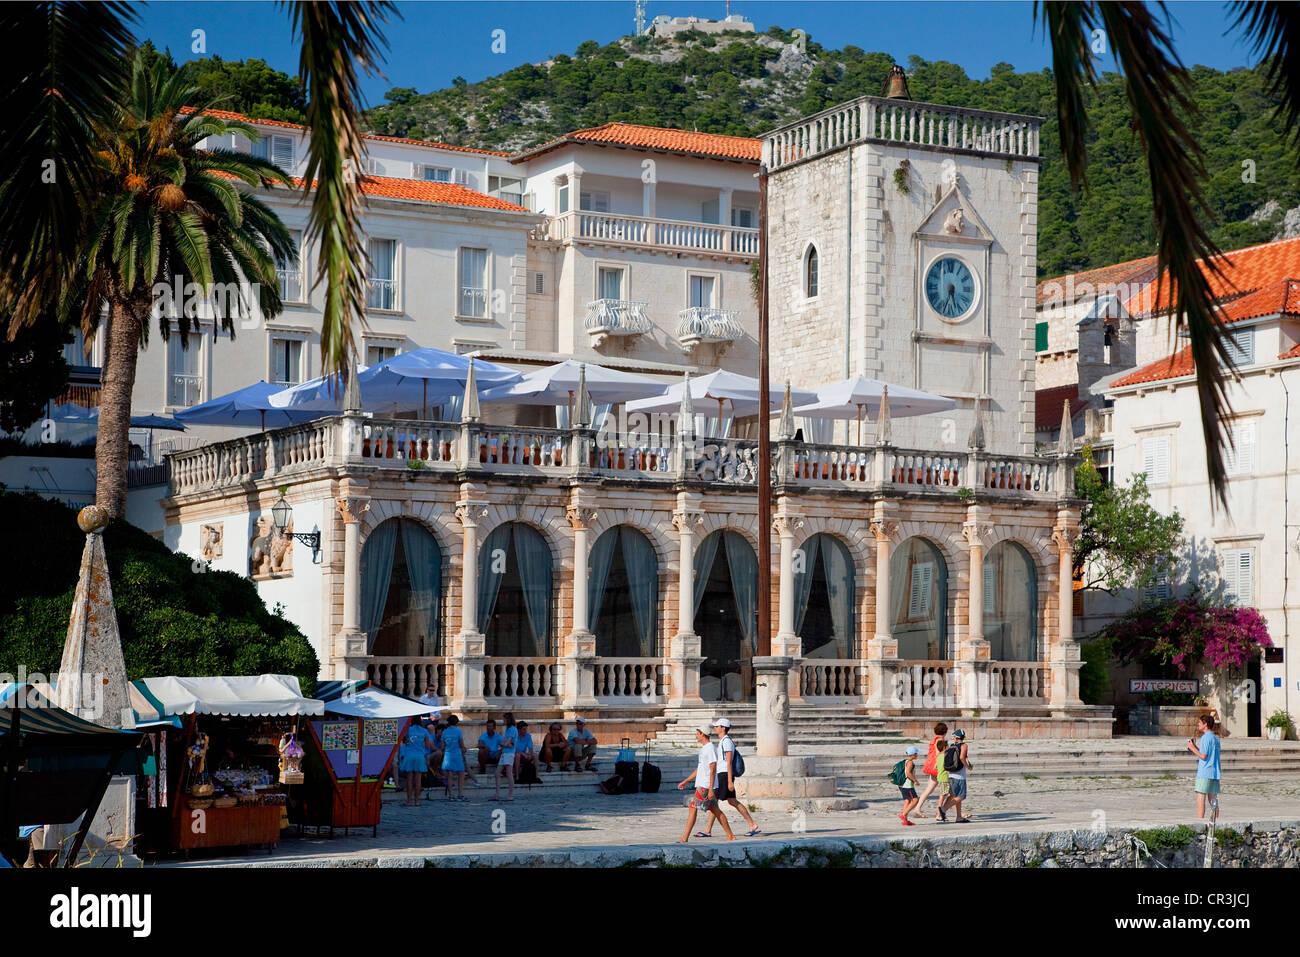 Croatia, Dalmatia, Dalmatian Coast, Hvar Island, Hvar City, luxury hotel - Stock Image